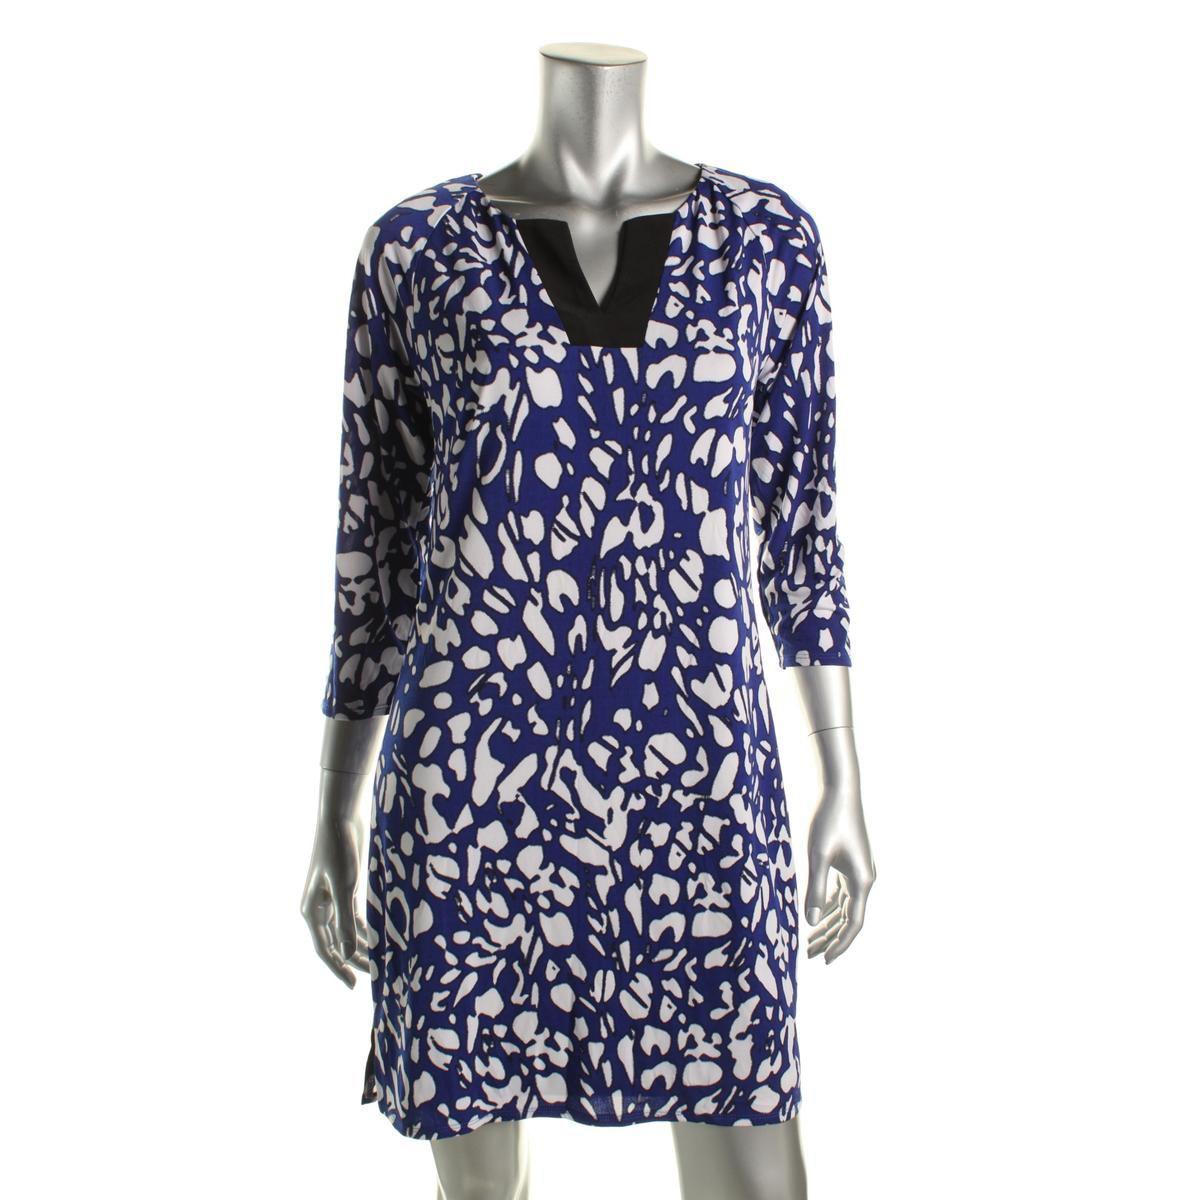 8ae7a84c7c Lyst - Laundry By Shelli Segal Womens Split Neck 3 4 Sleeve Wear To ...